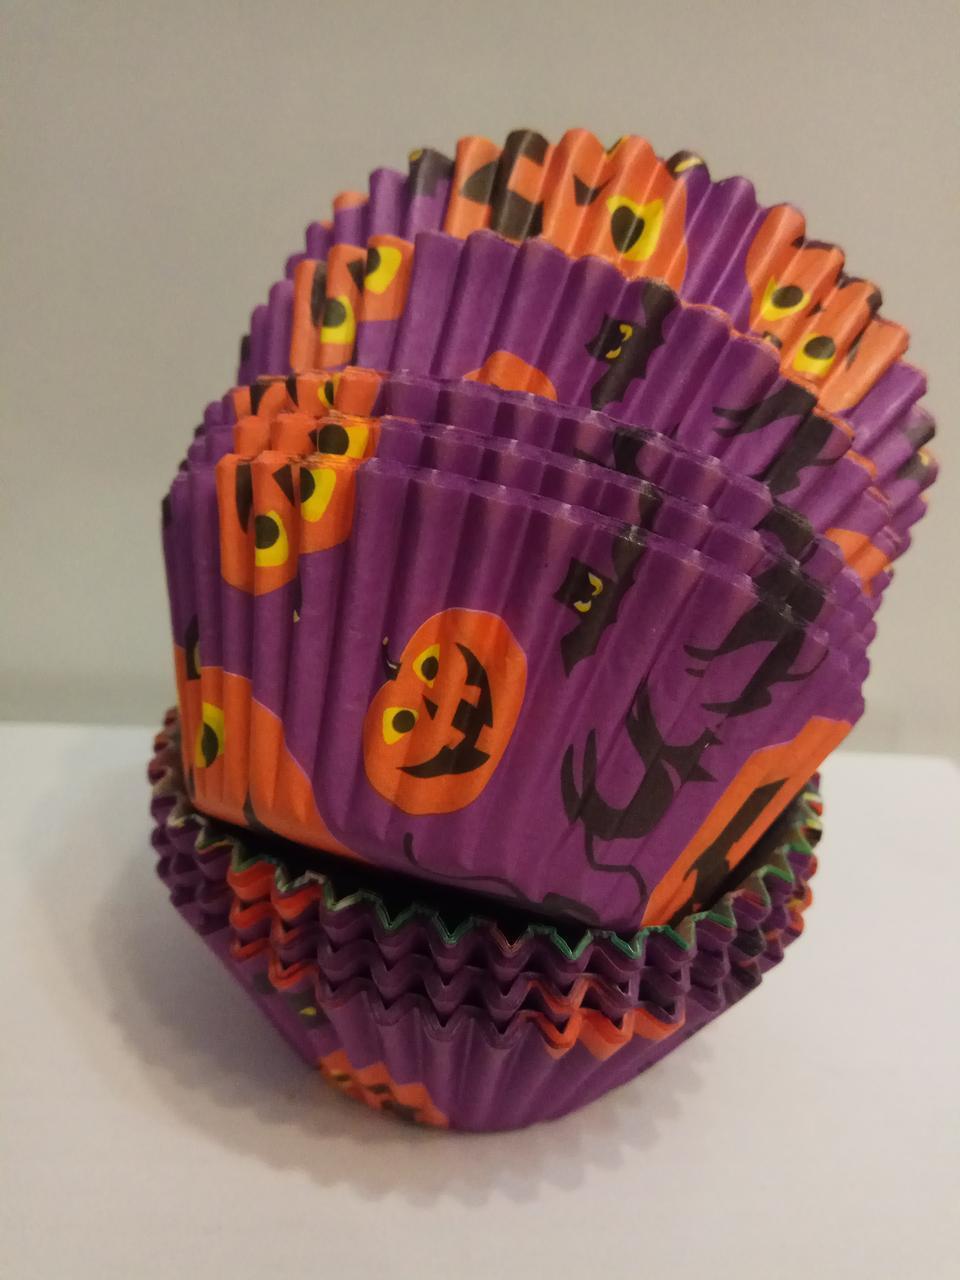 Форма бумажная для кексов Хэллоуин 50 шт.